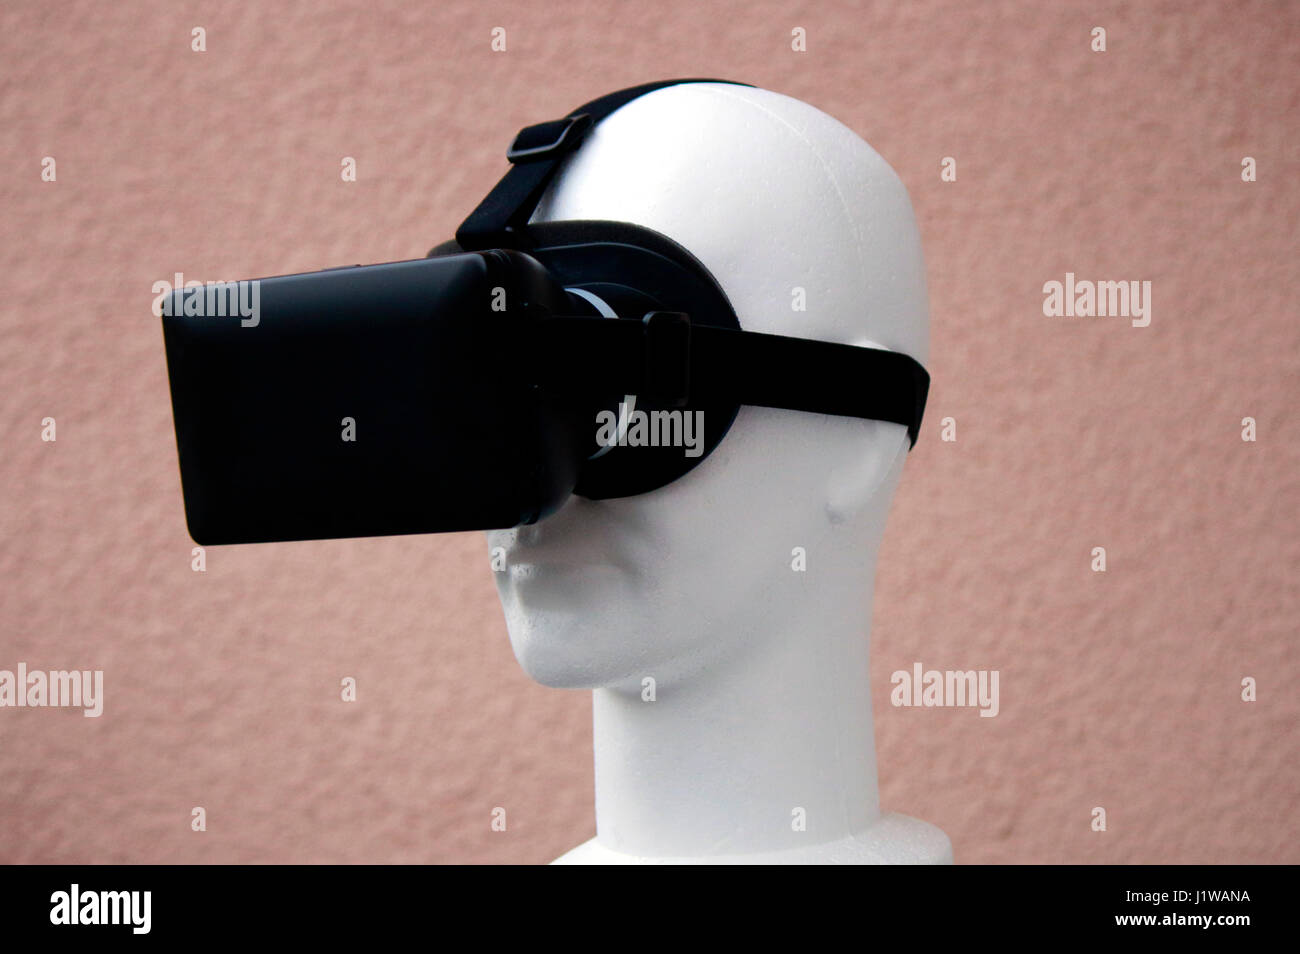 Symbolbild VR/ Virtuelle Realitaet - Datenbrille. Banque D'Images